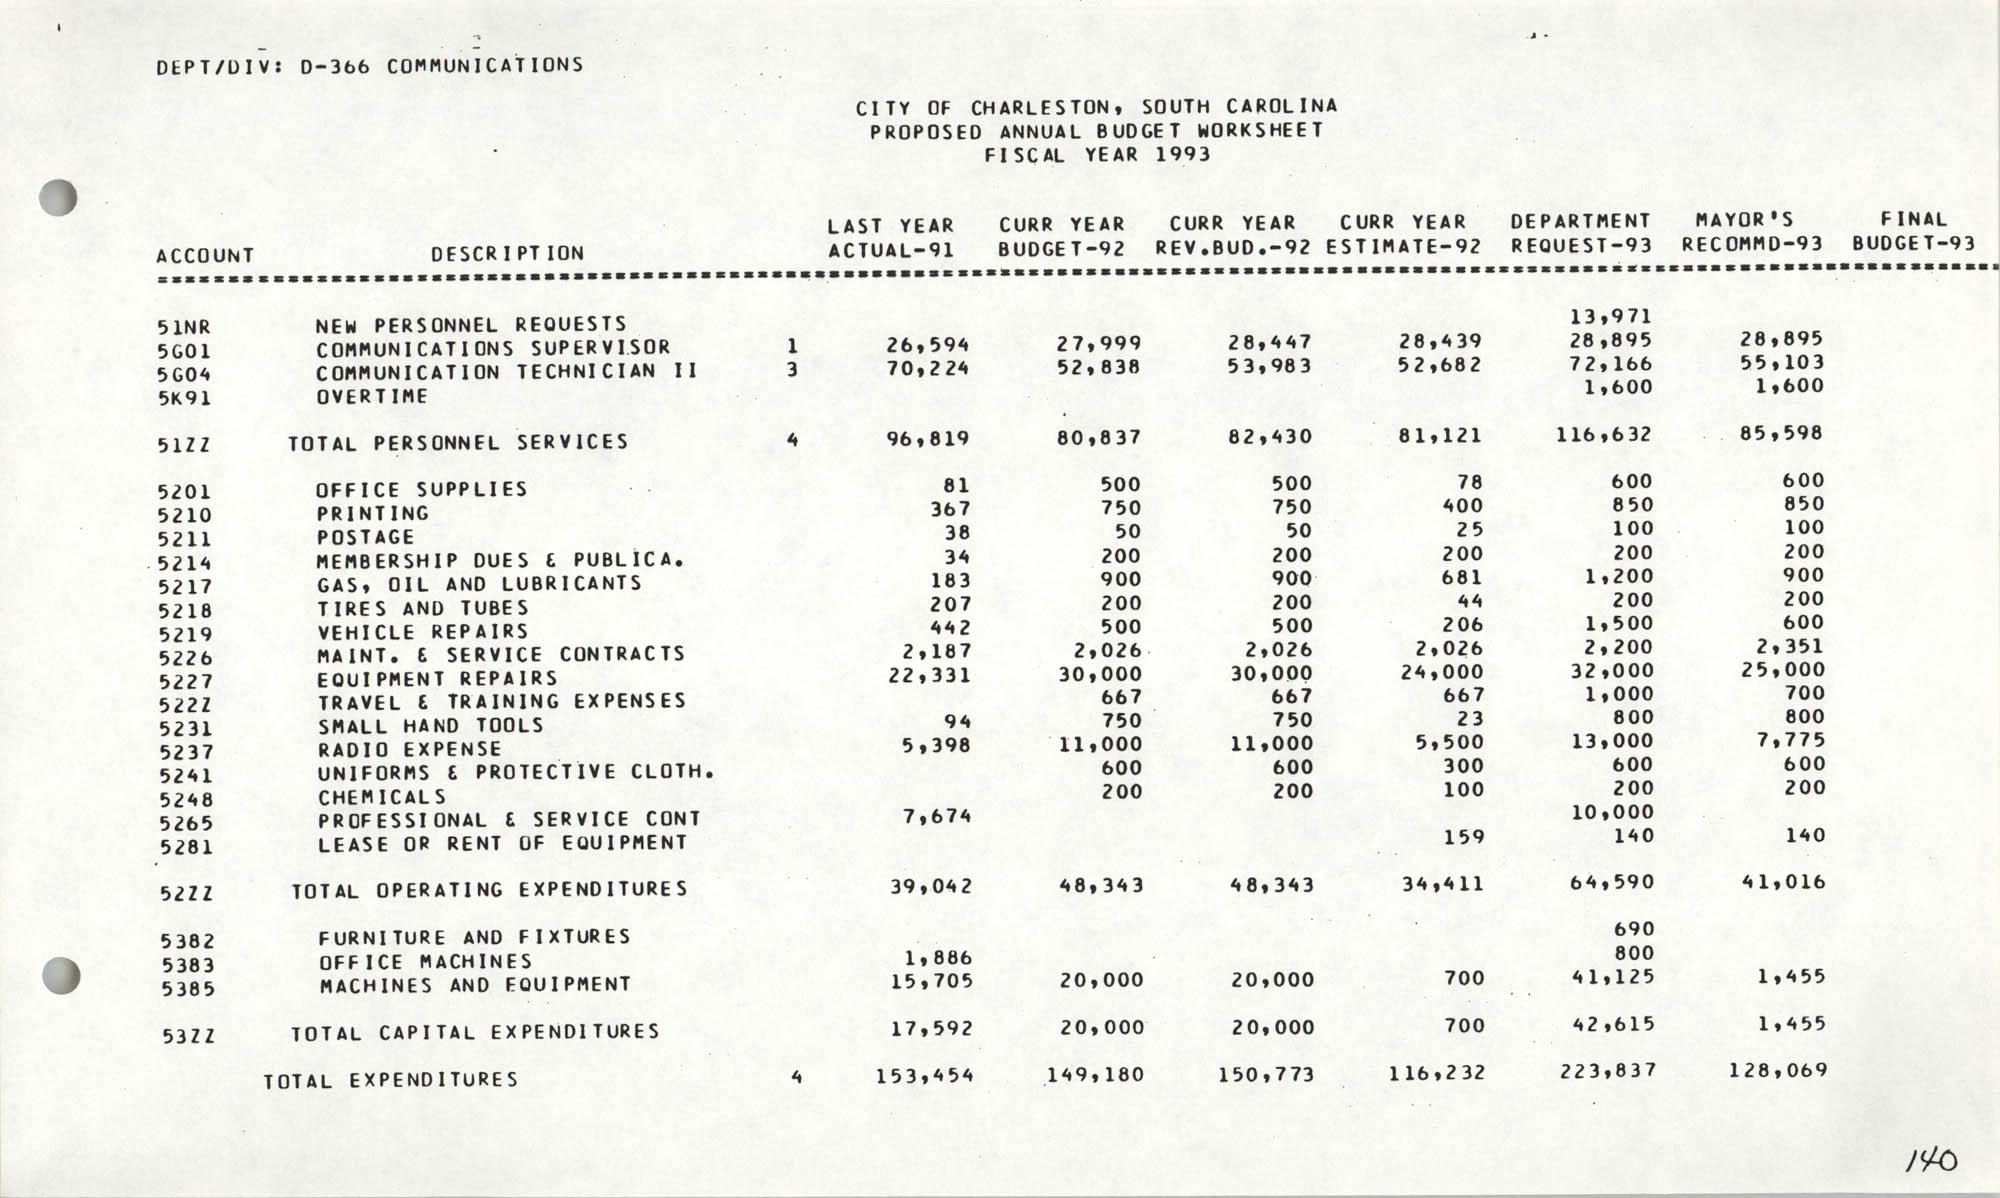 The City Council of Charleston, South Carolina, 1993 Budget, Page 140